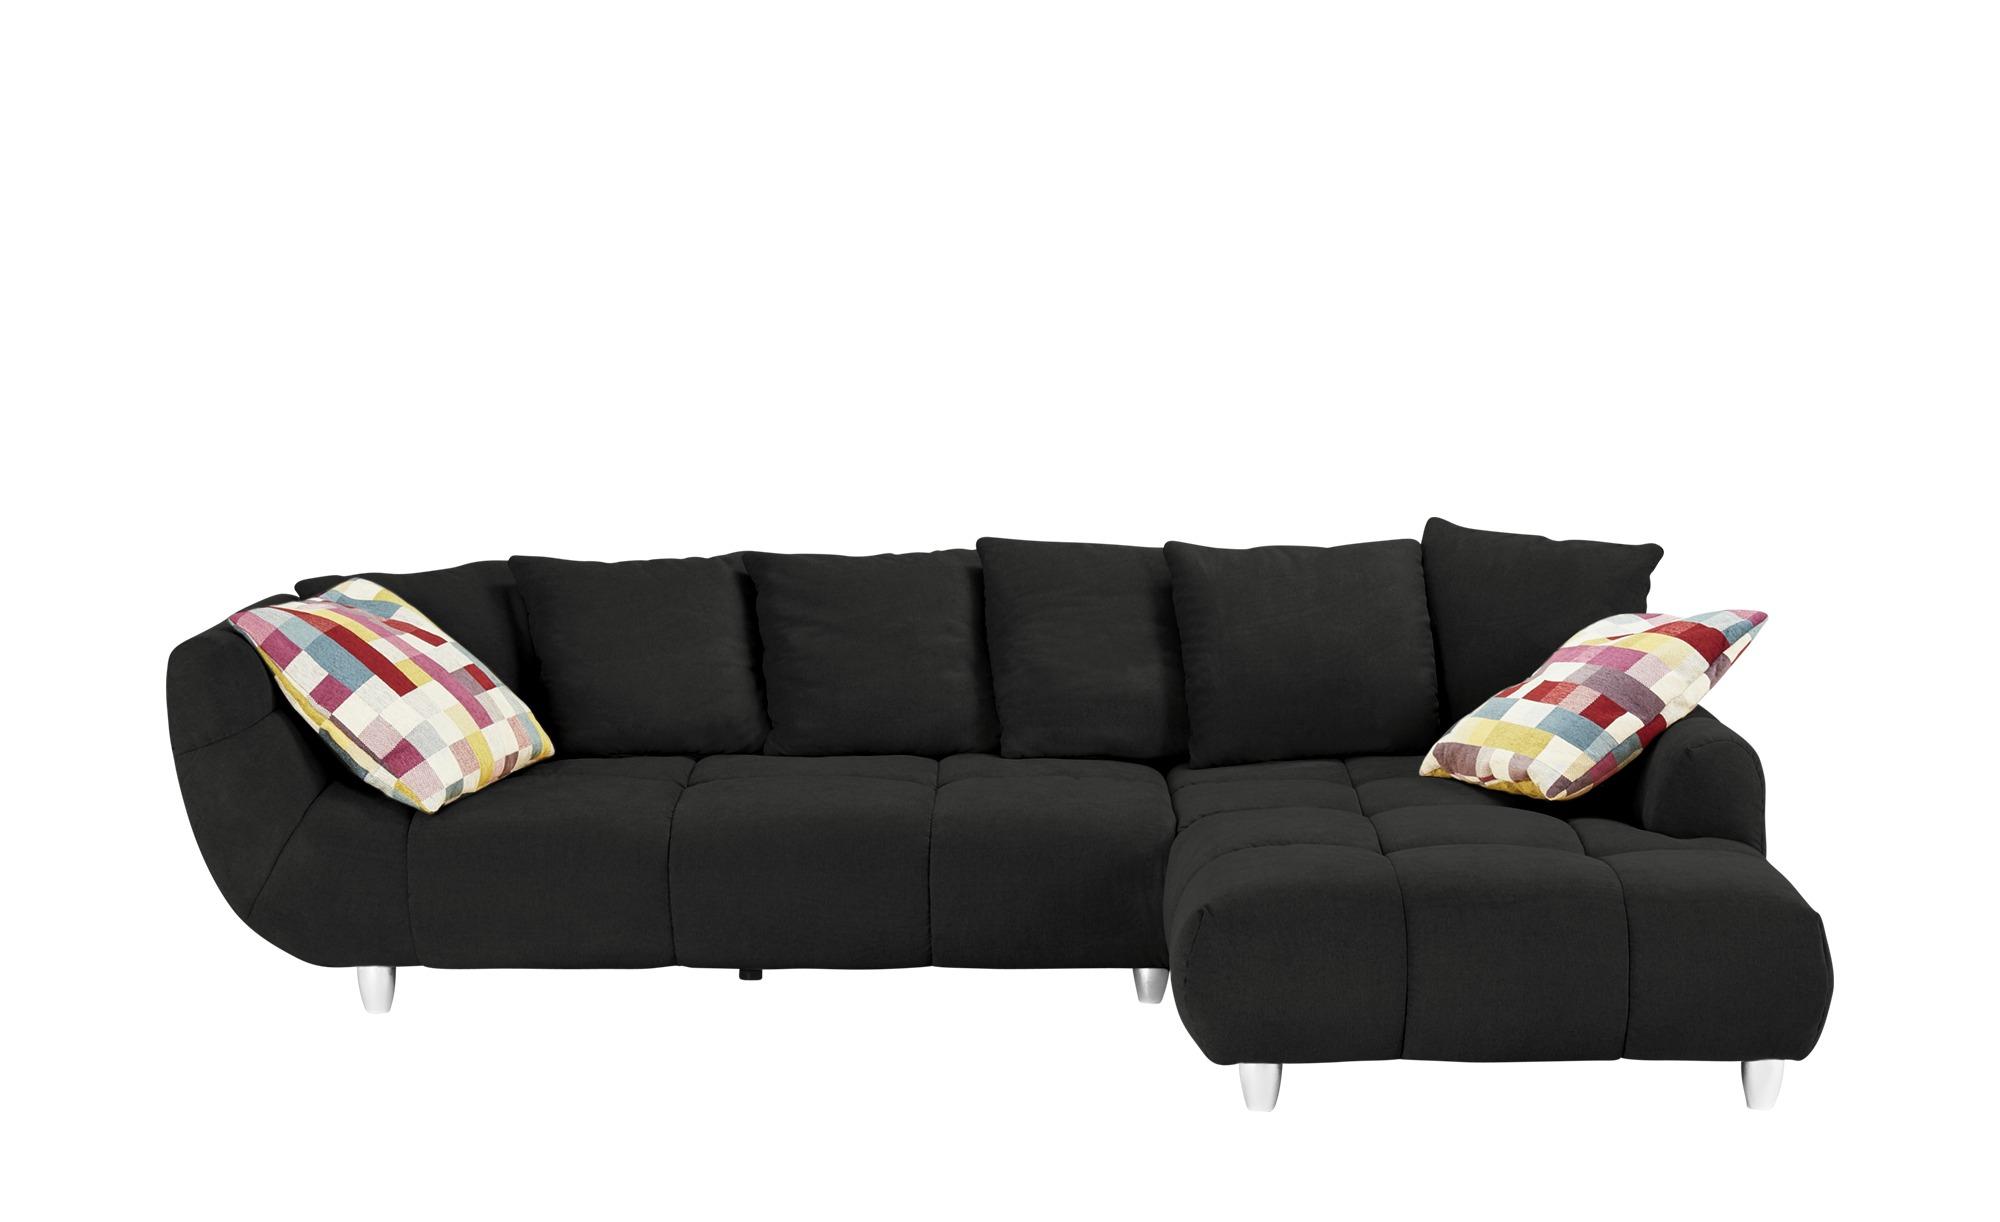 Ecksofa imke breite h he 90 cm schwarz online kaufen bei for Ecksofa 1 90